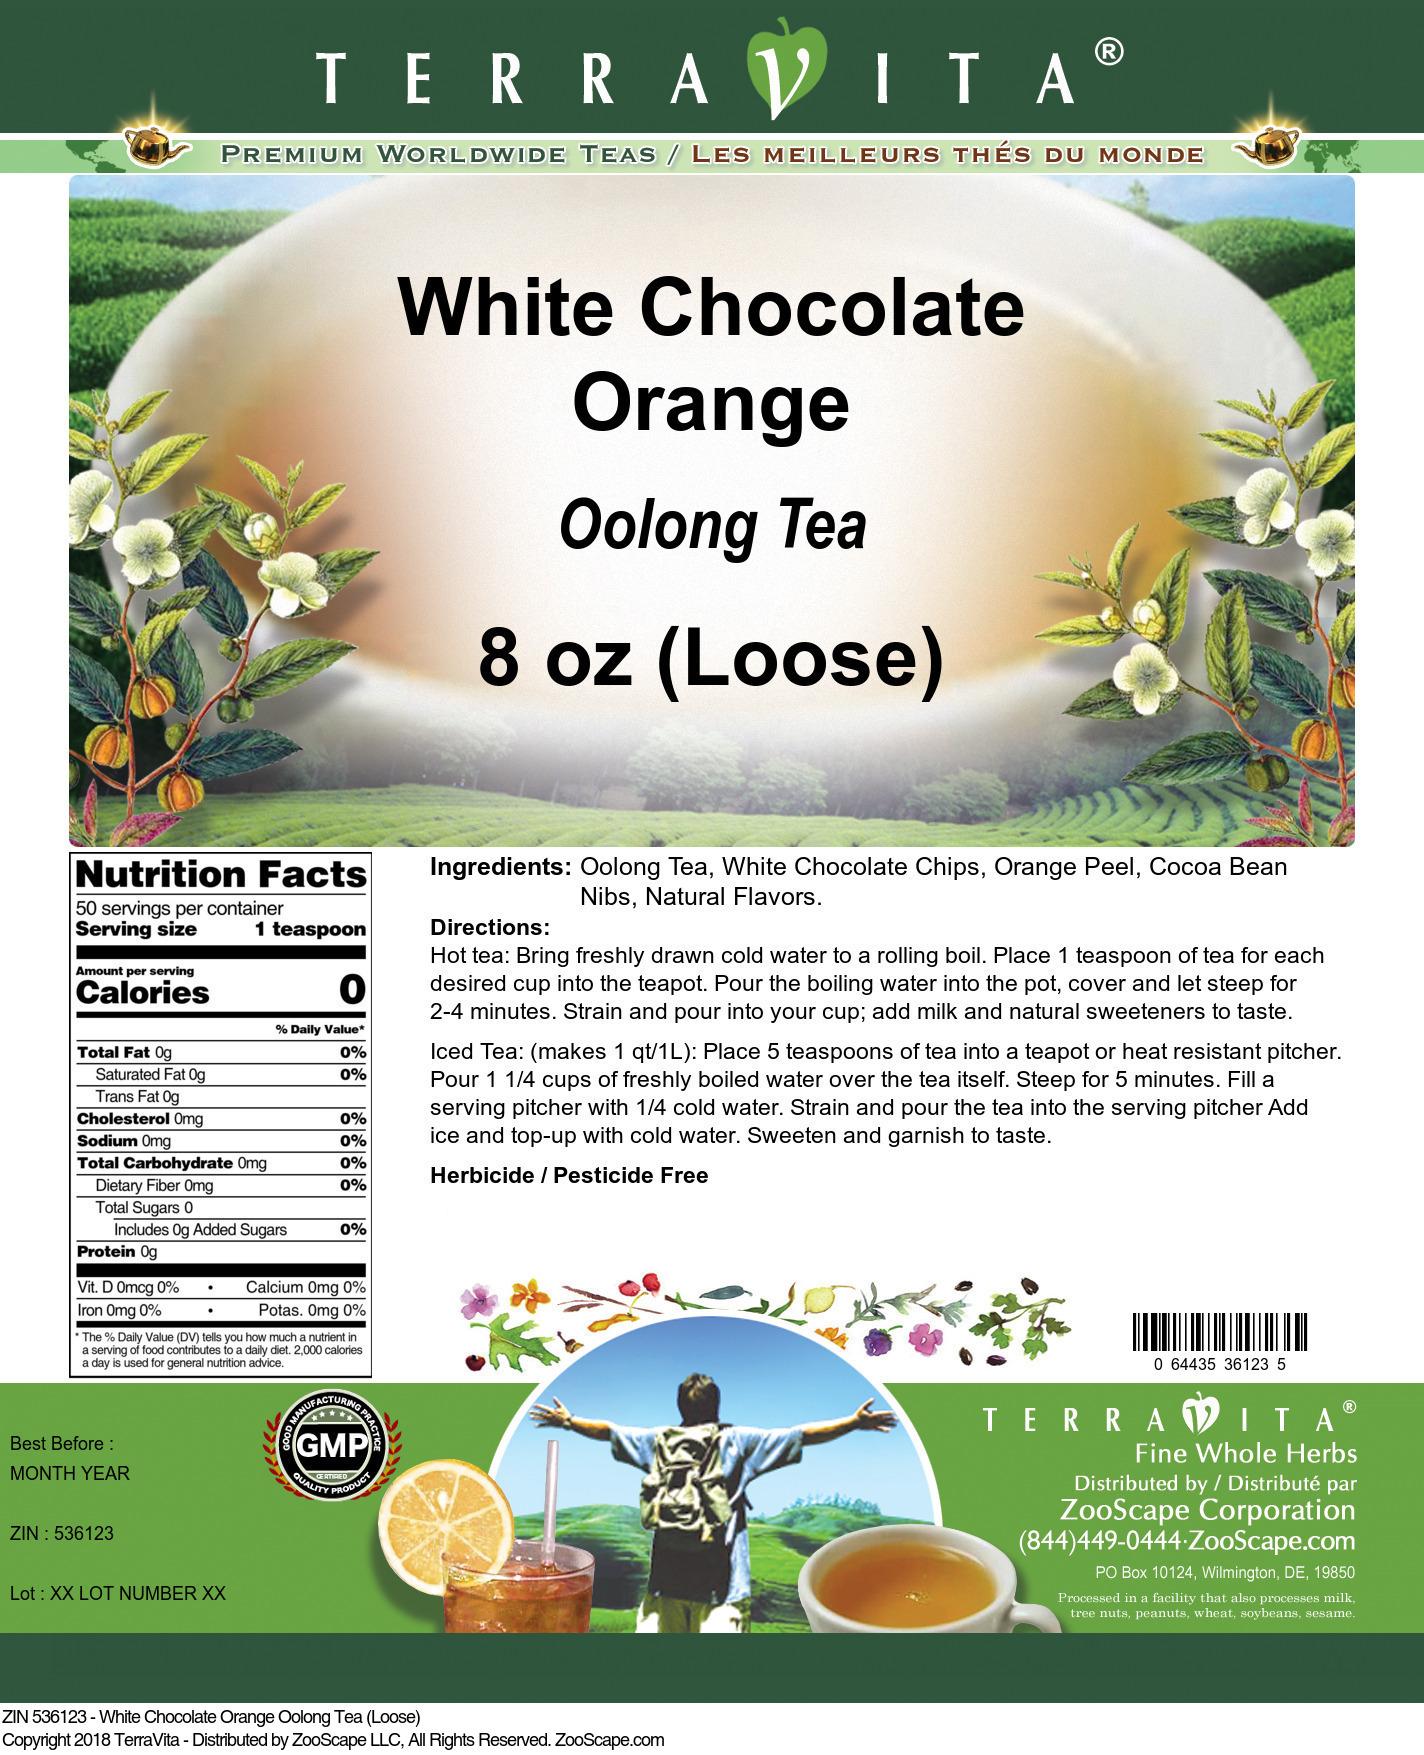 White Chocolate Orange Oolong Tea